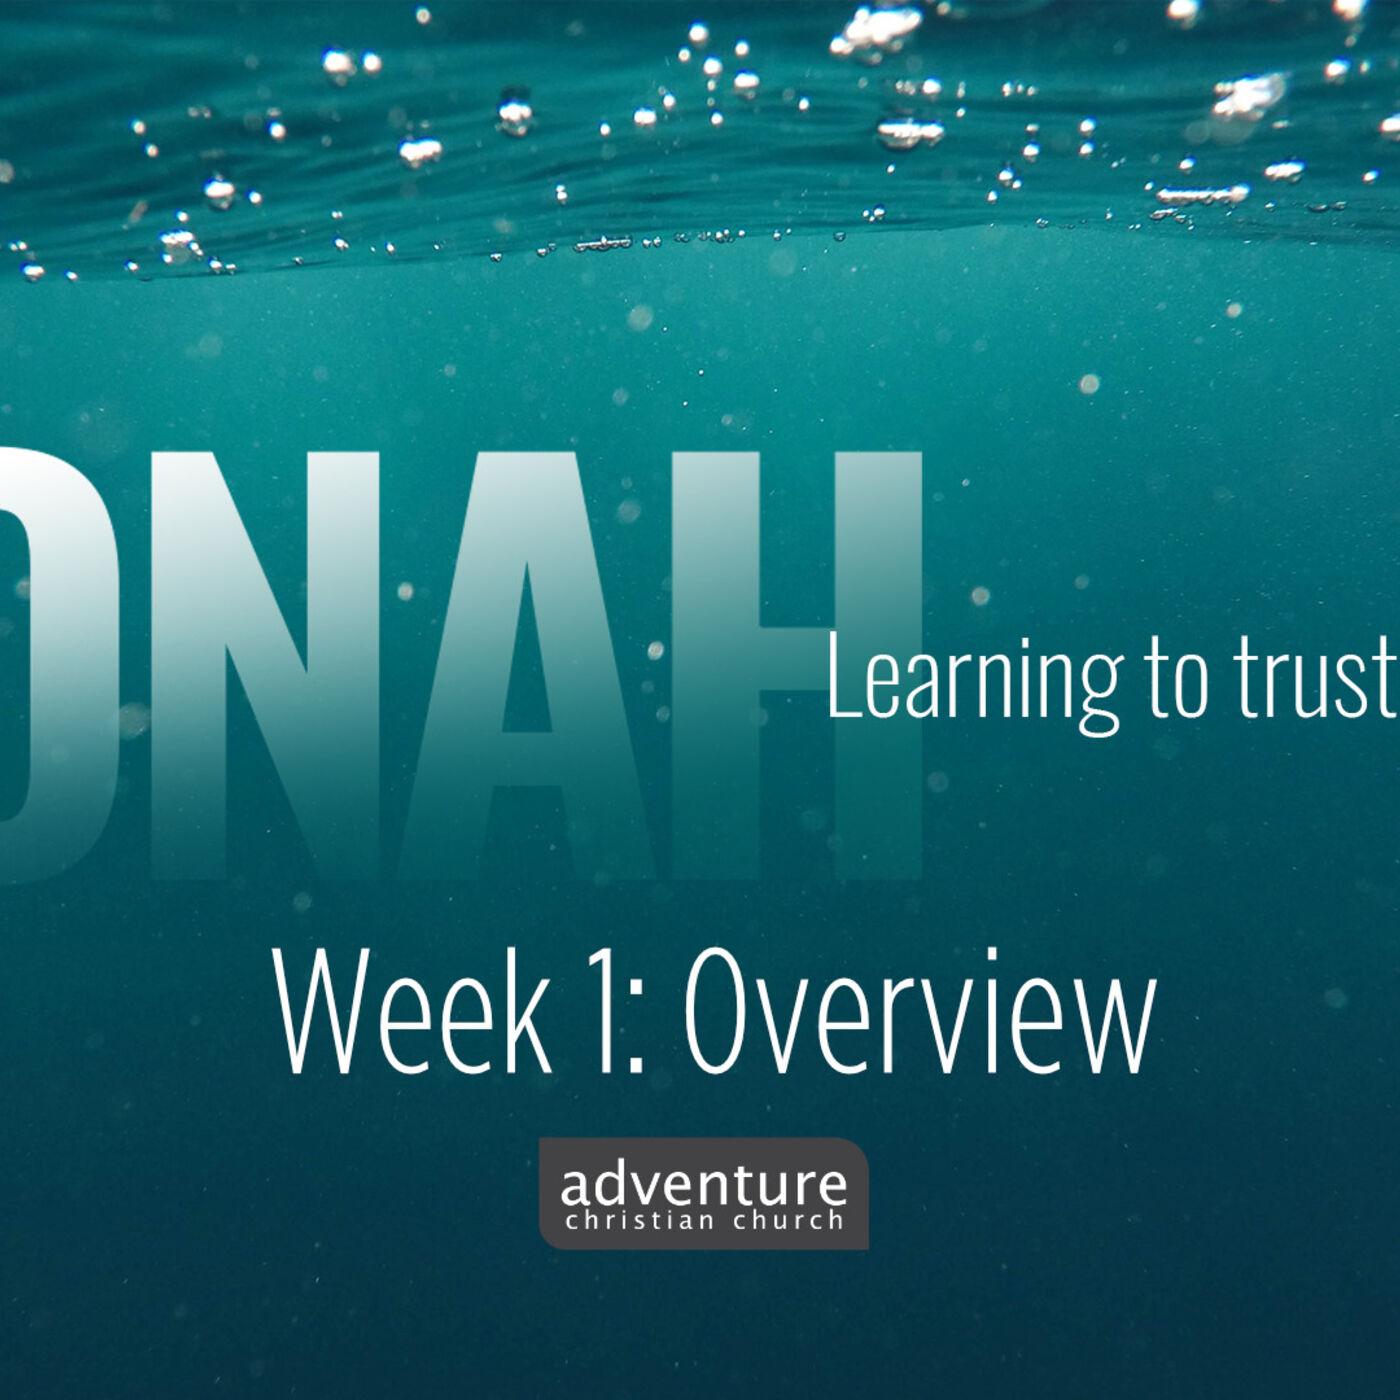 Jonah - Week 1: Overview